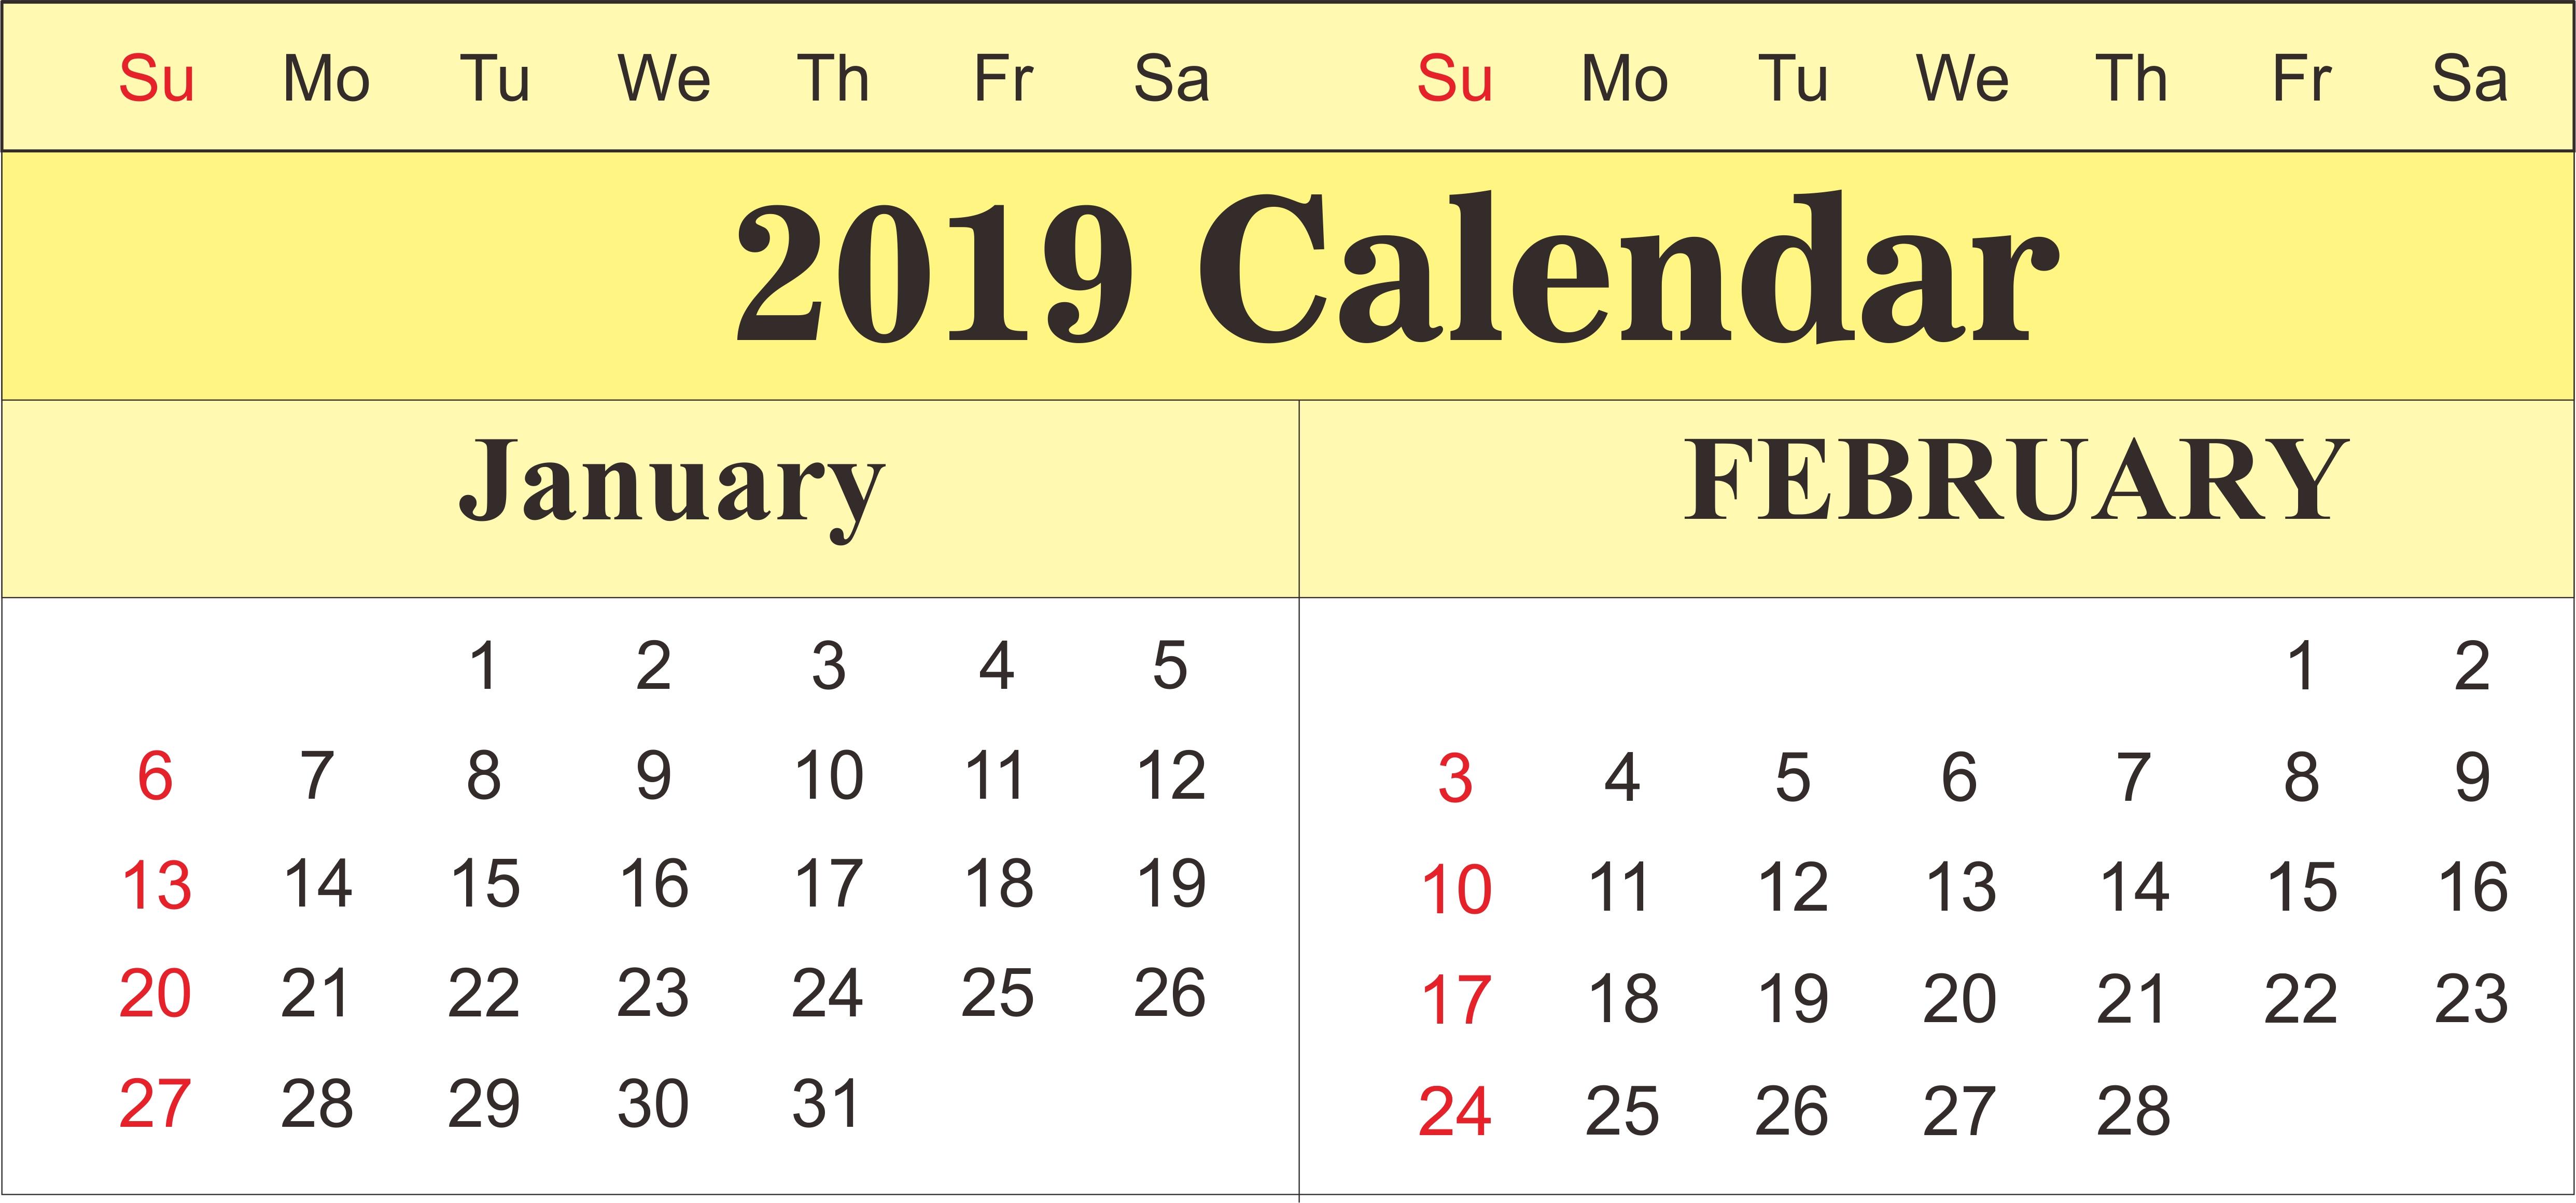 Printable January And February 2019 Calendar | 250+ February 2019 Calendar Feb 9 2019